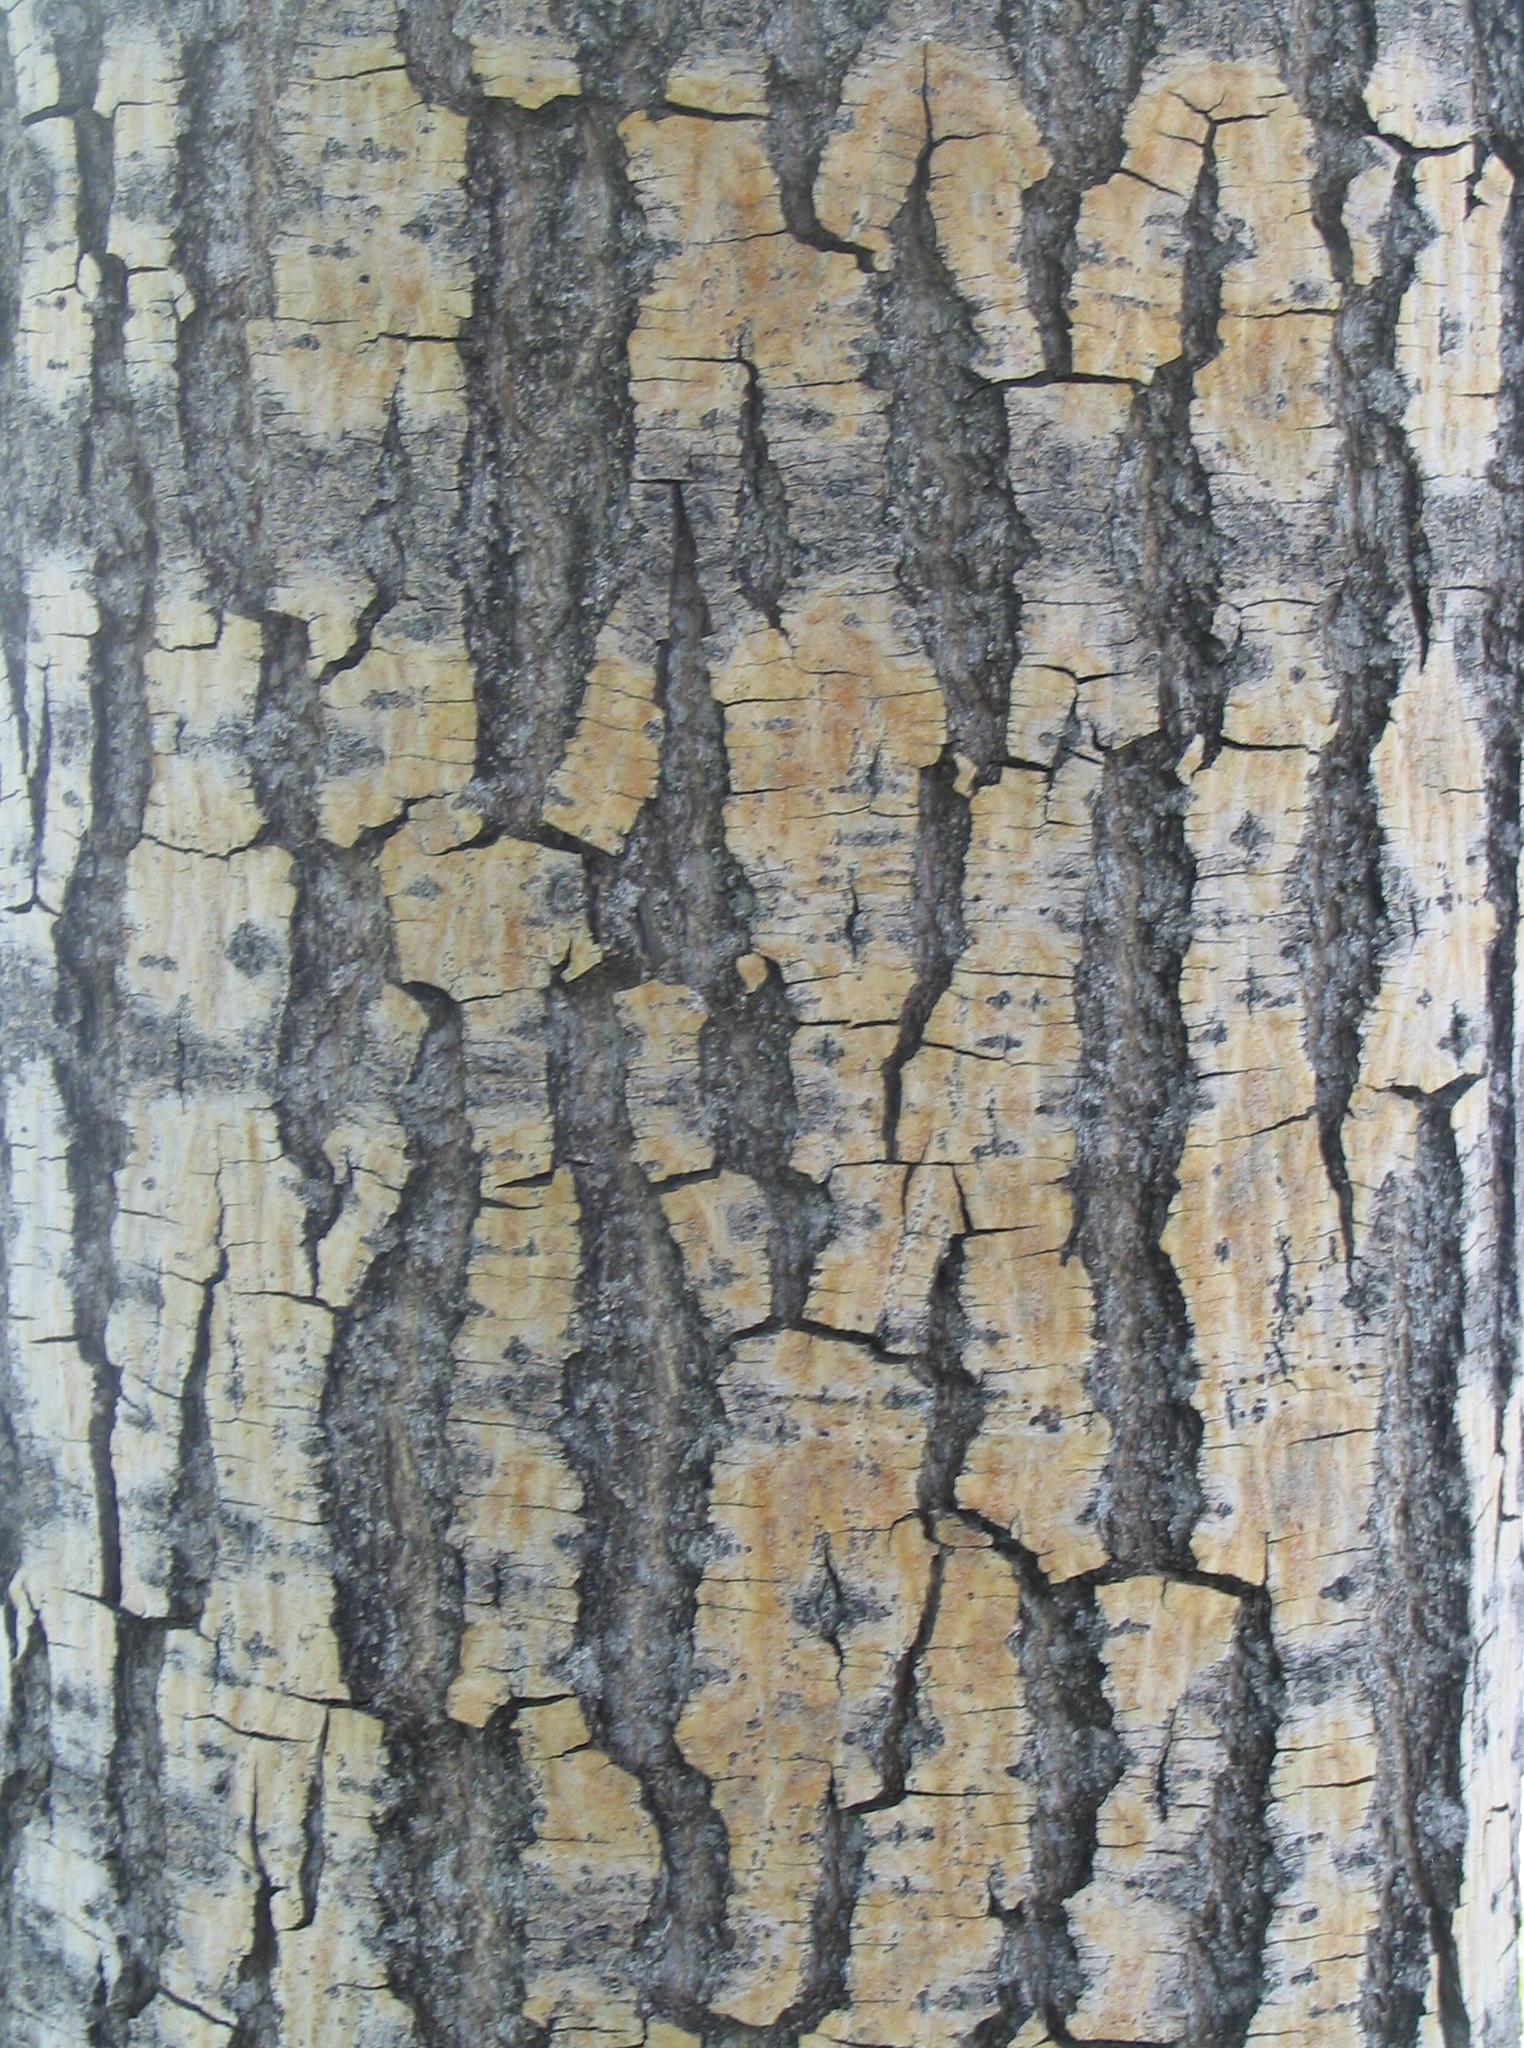 File:Bark texture wood.jpg - Wikimedia Commons